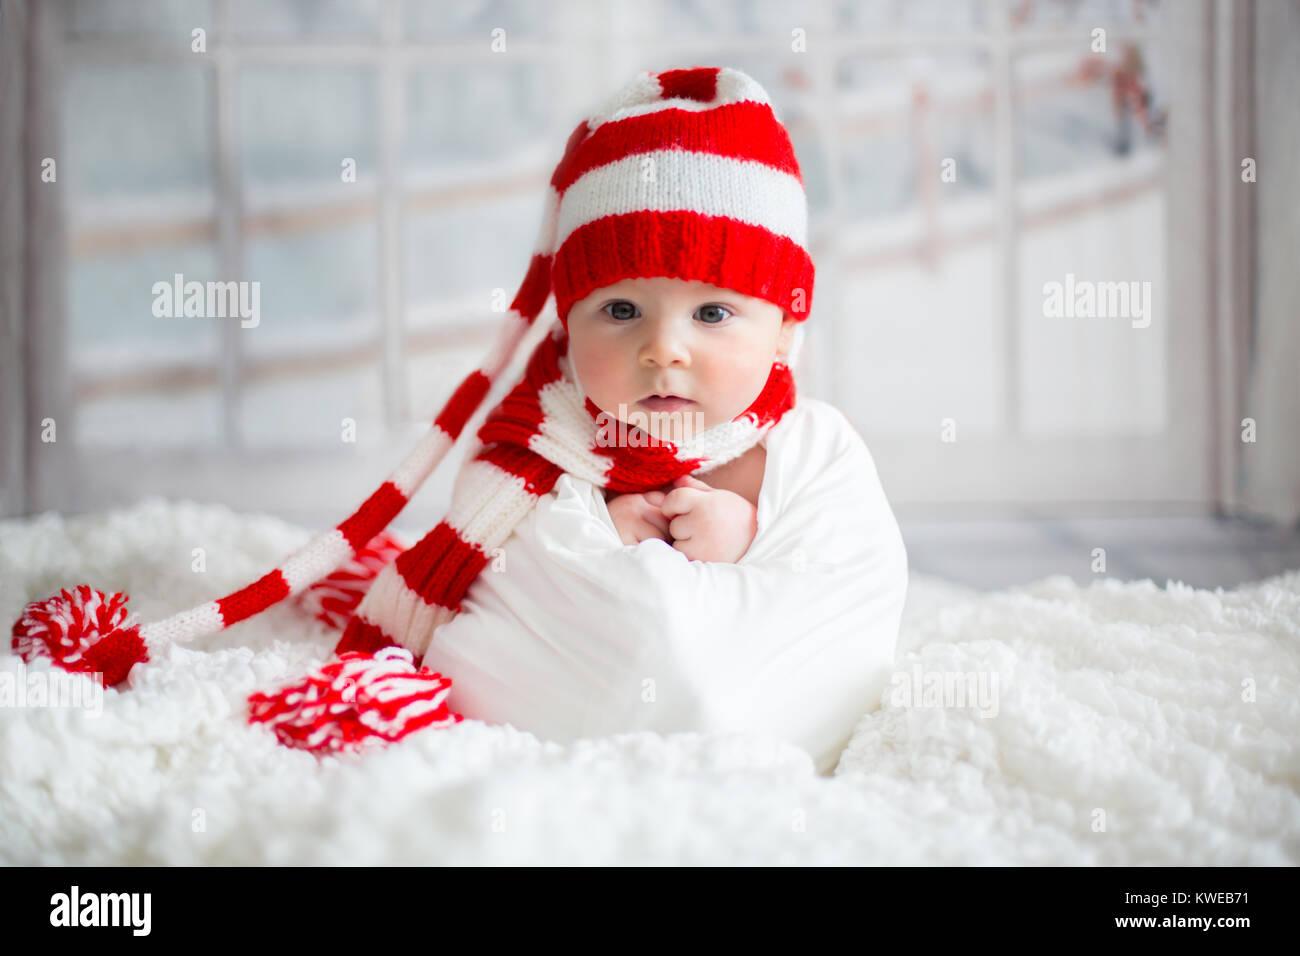 christmas portrait of cute little newborn baby boy, wearing santa